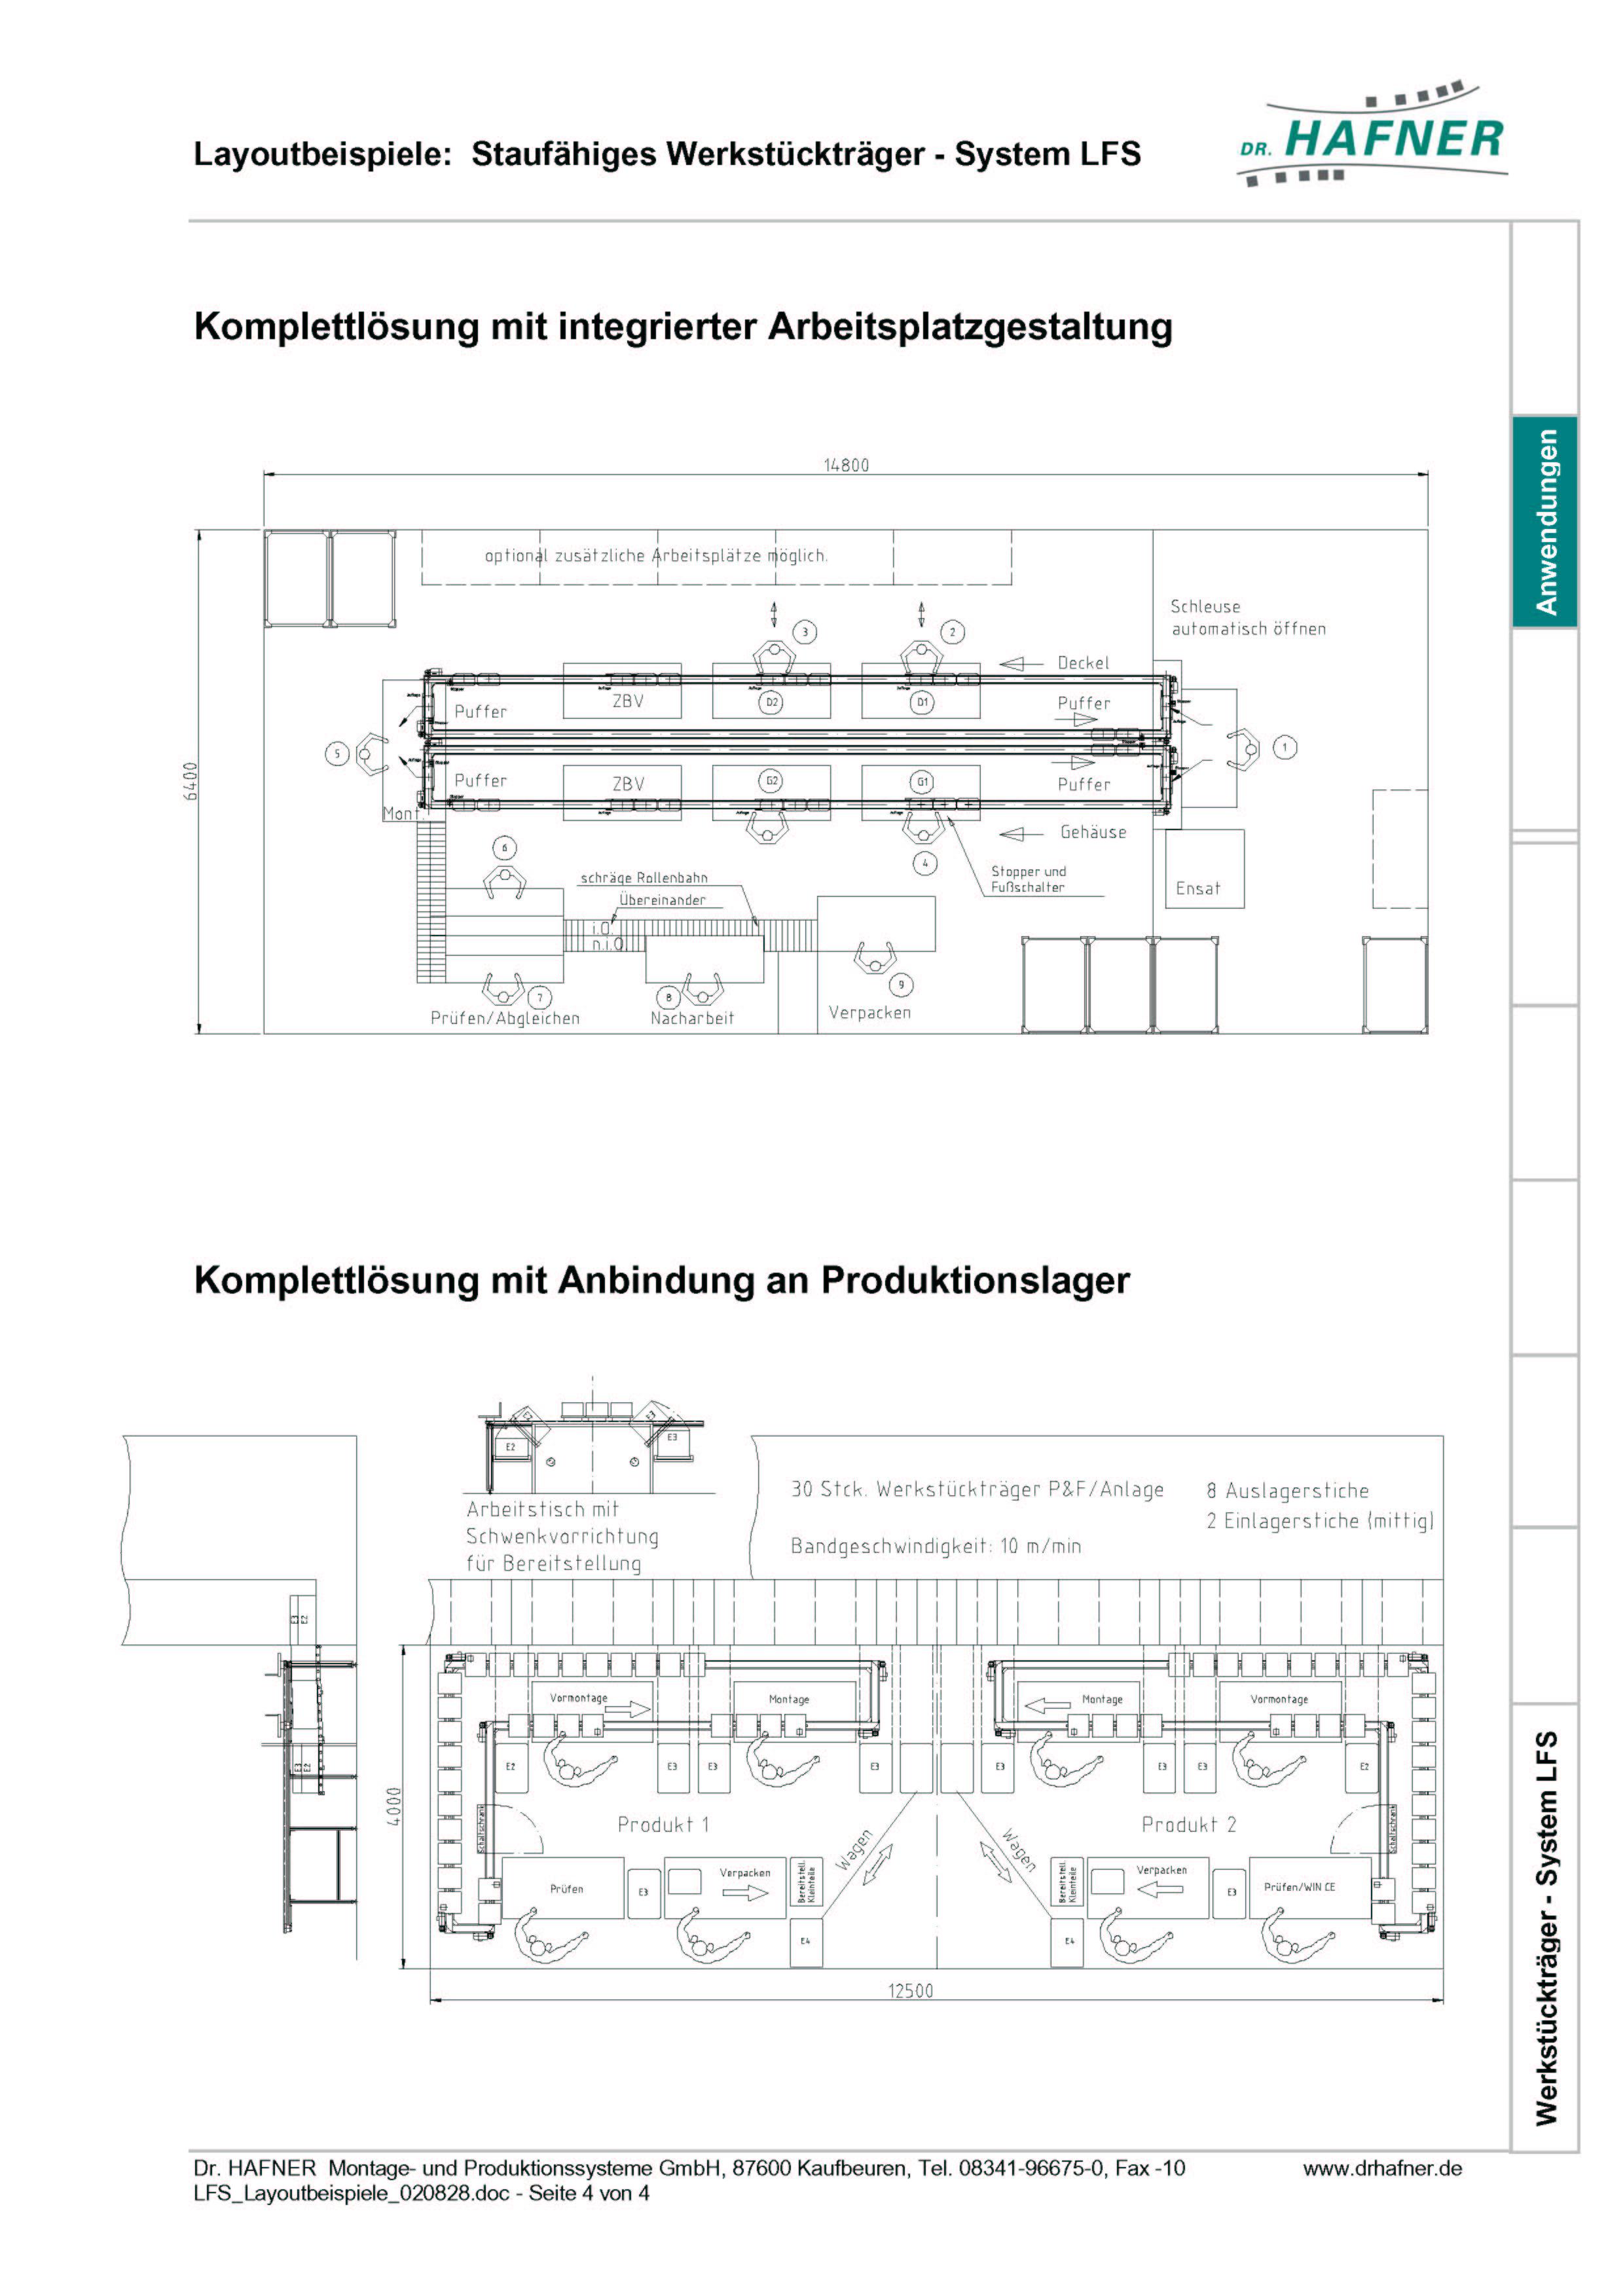 Dr. HAFNER_PKWP_35 Layout Arbeitsplatzgestaltung Produktionslager Werkstückträger